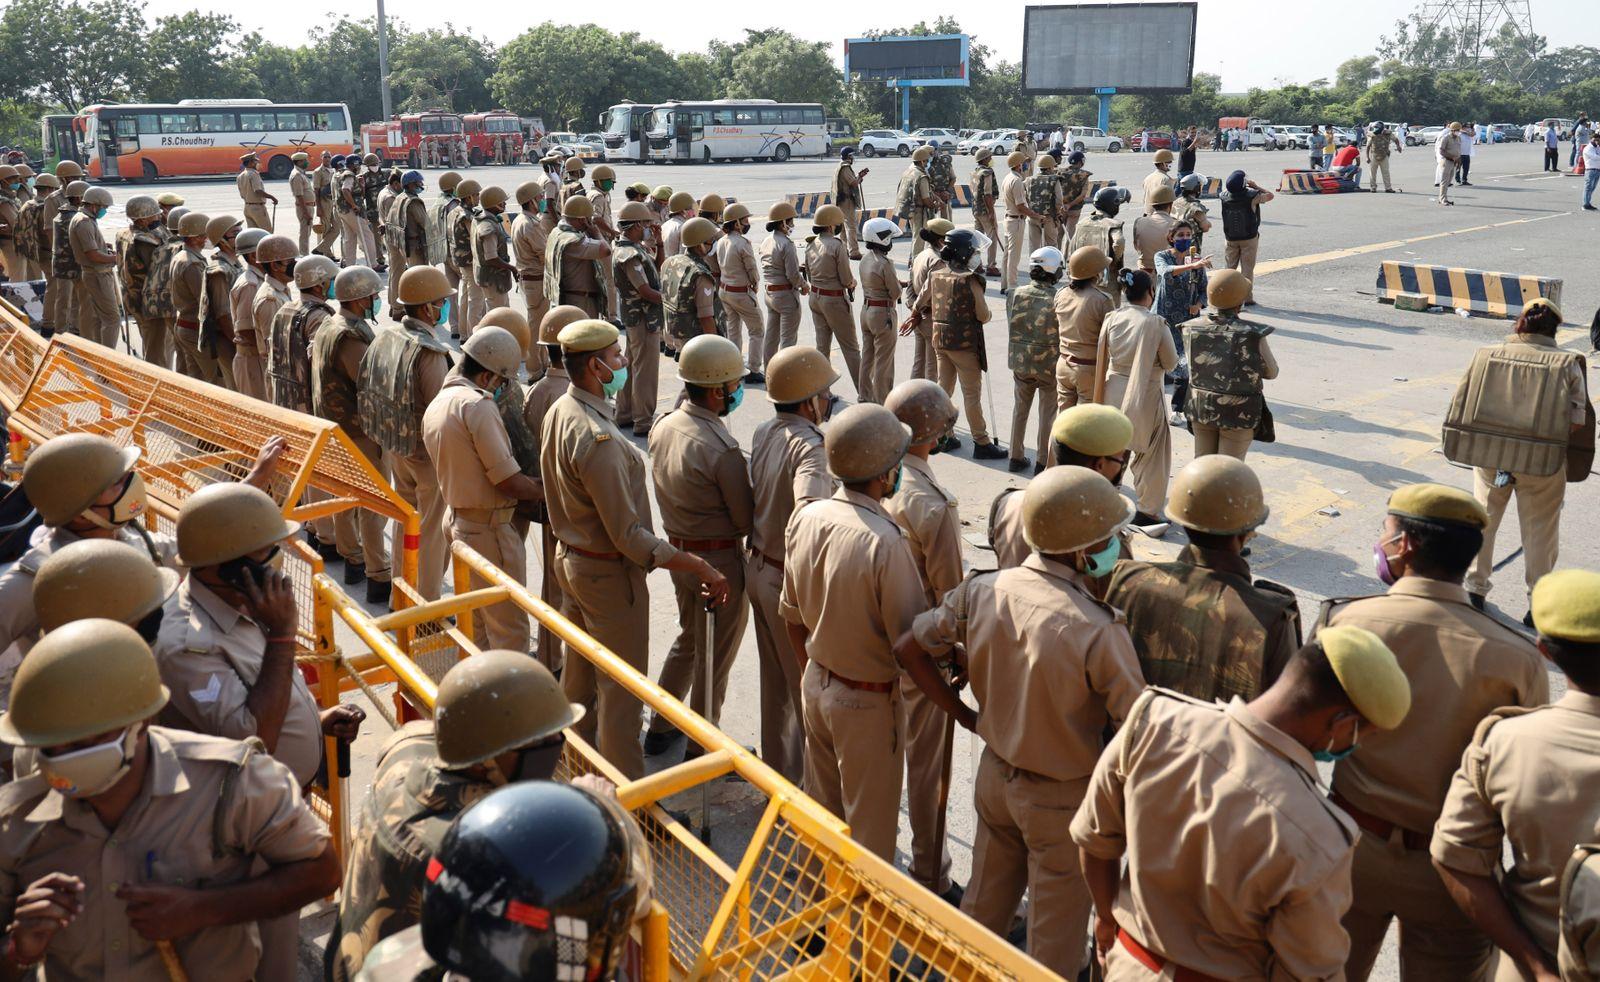 Congress workers protest at the Delhi Uttar Pradesh Border, New Delhi, India - 03 Oct 2020